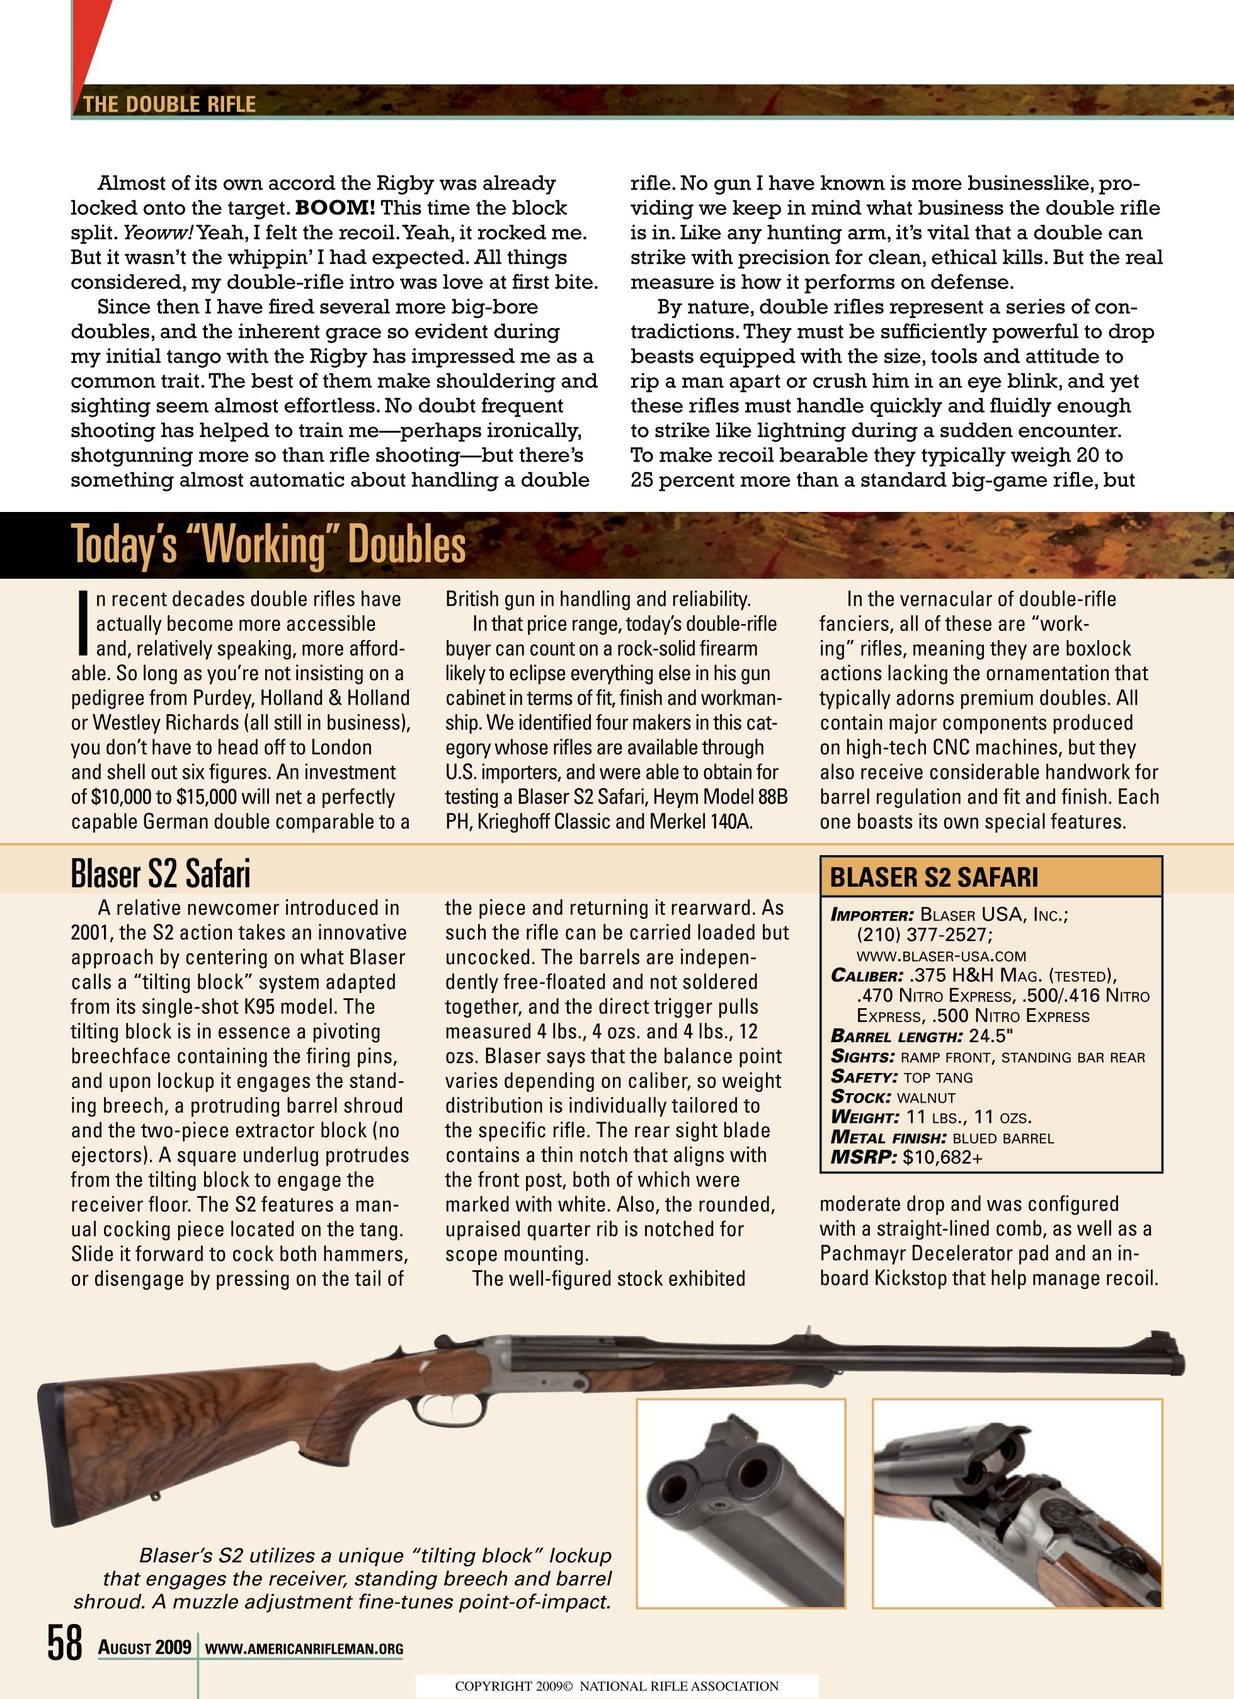 American Rifleman - August 2009